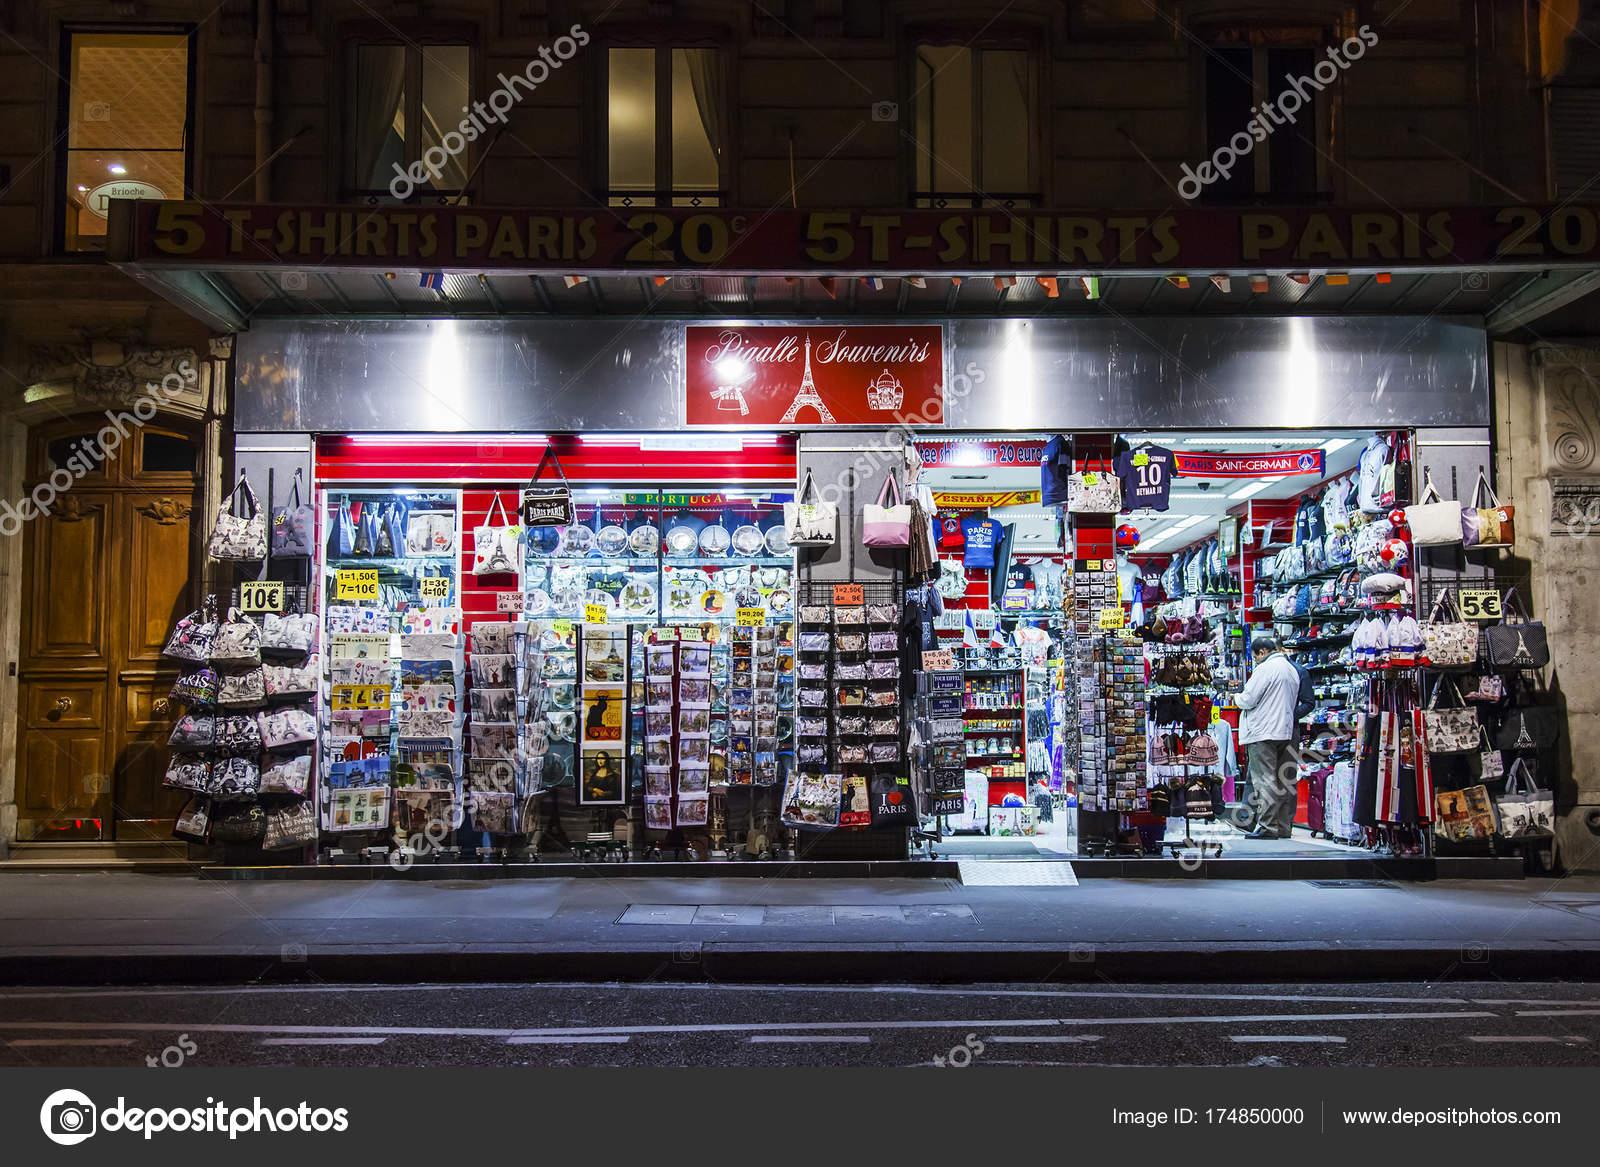 Parigi francia ottobre 2017 souvenirs vari sono esposti una vetrina